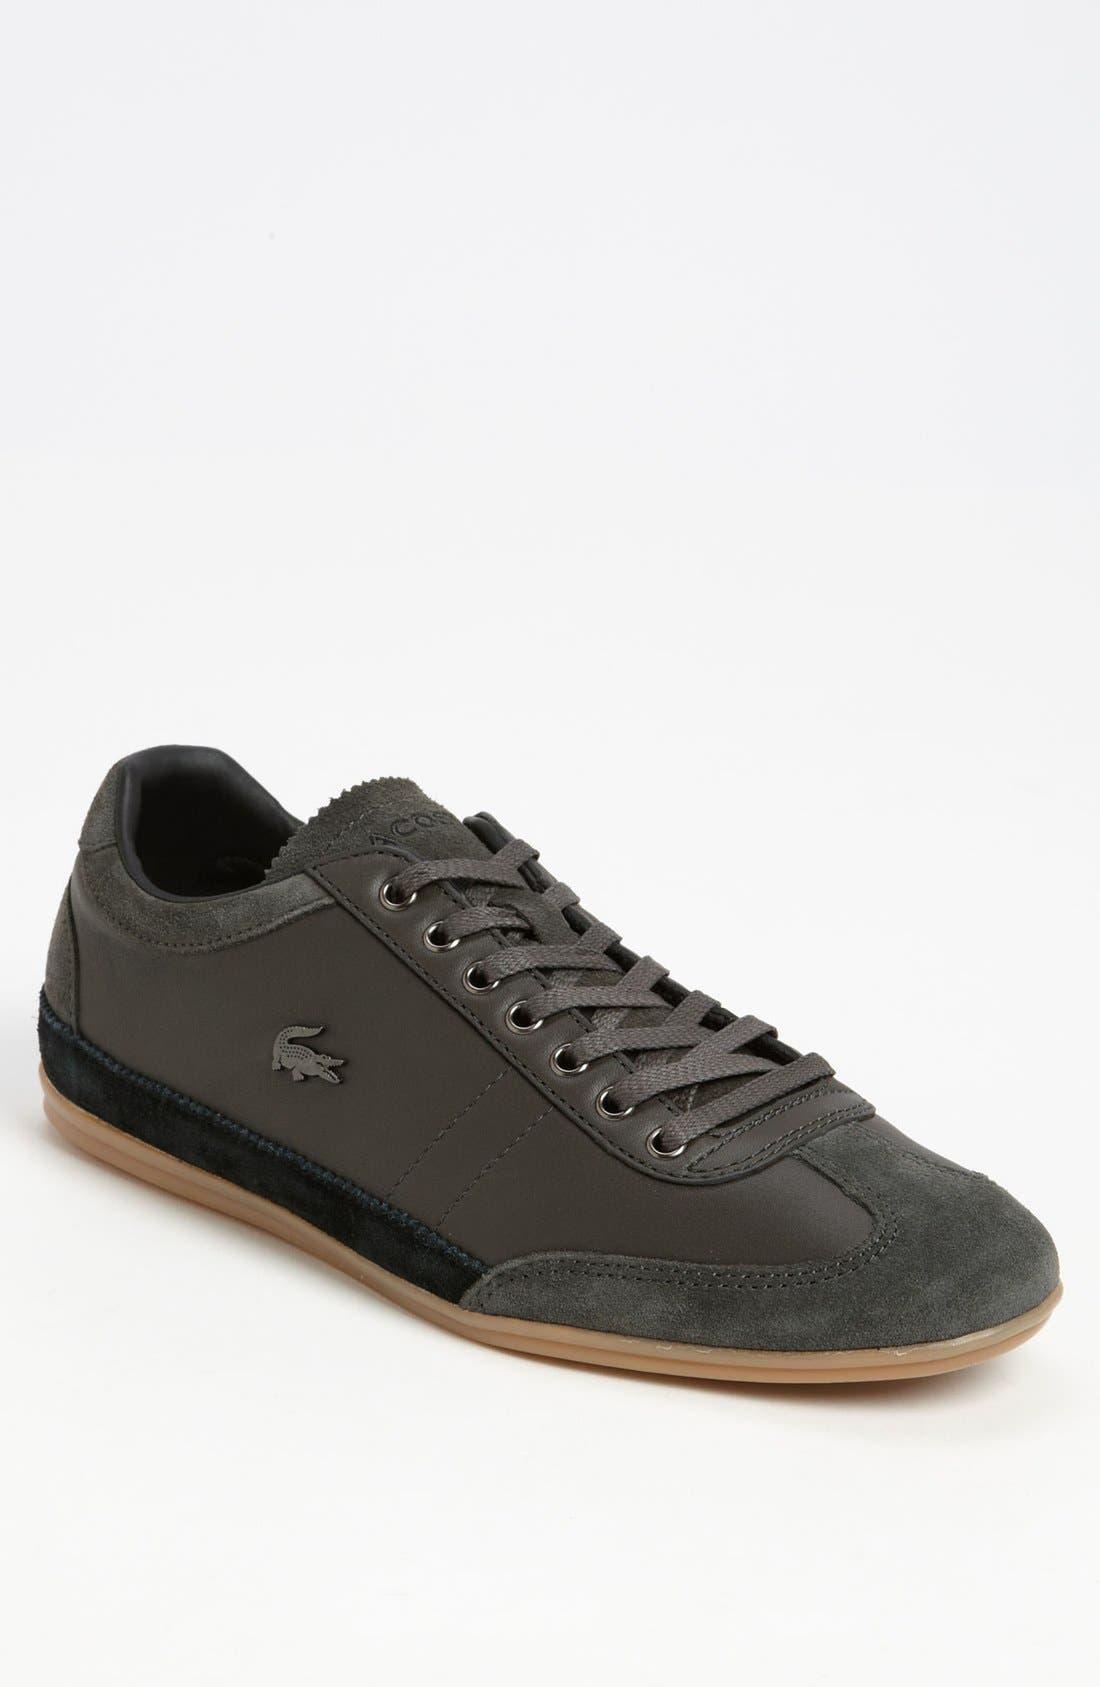 Main Image - Lacoste 'Misano 15' Sneaker (Men)